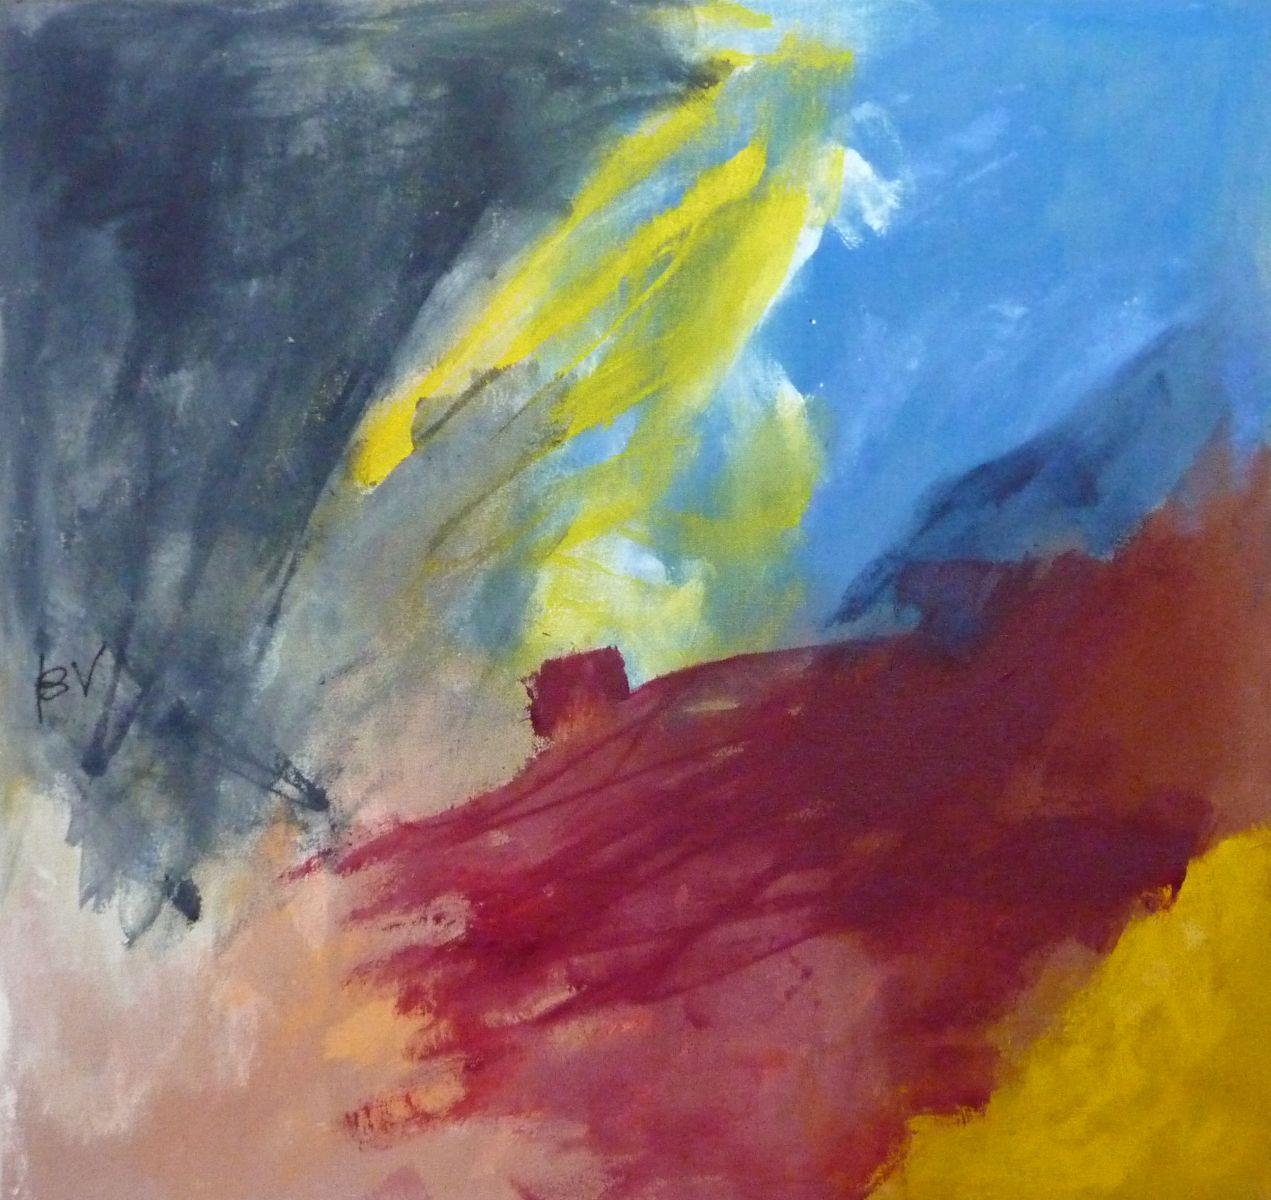 Lyrisch abstract – acryl op doek – 2010-2012